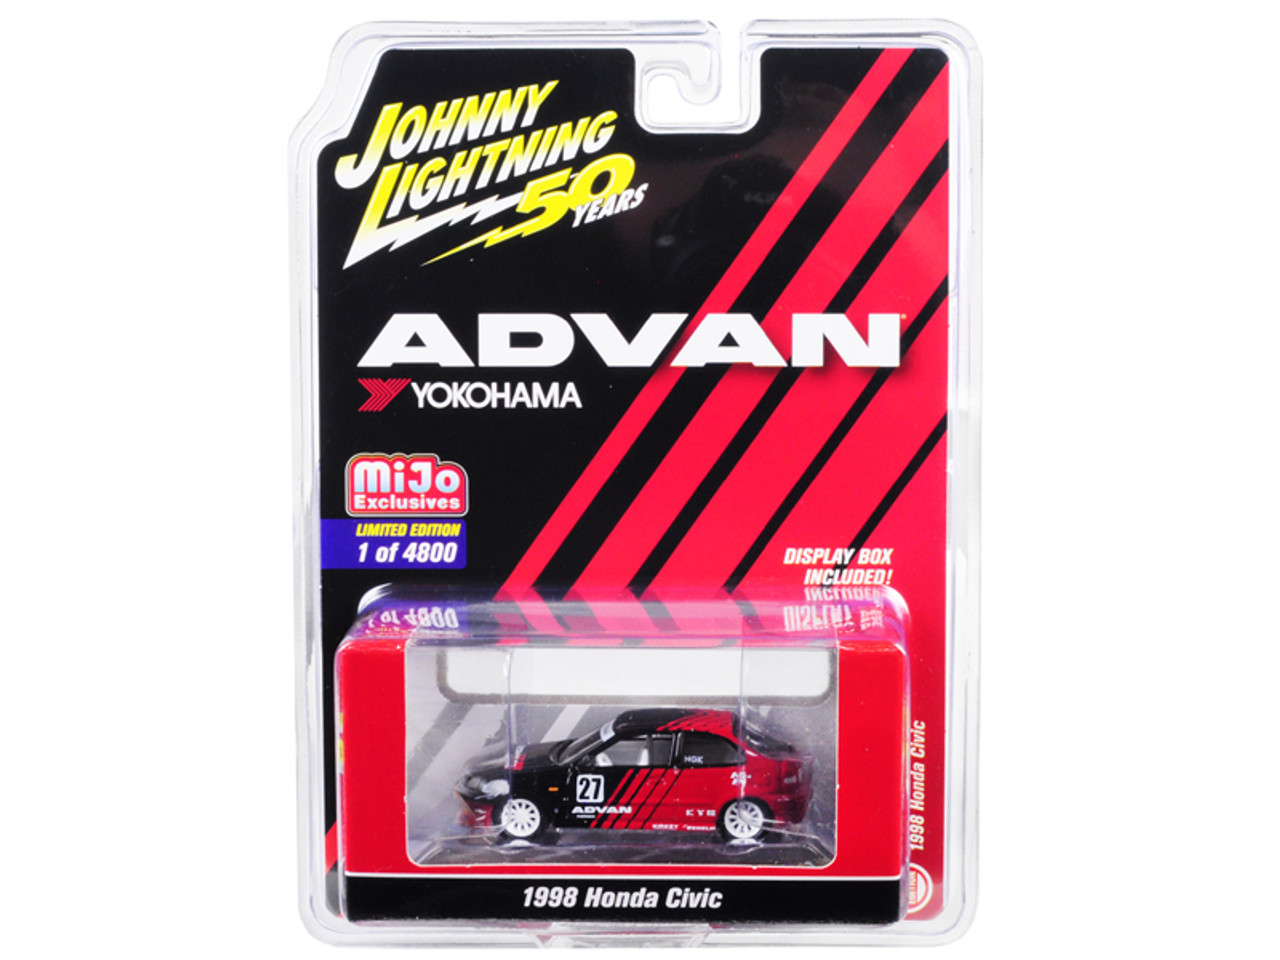 "1/64 Johnny Lightning 1998 Honda Civic #27 ADVAN Yokohama ""Johnny Lightning 50th Anniversary"" Limited Edition to 4,800 pieces Worldwide Diecast Car Model"